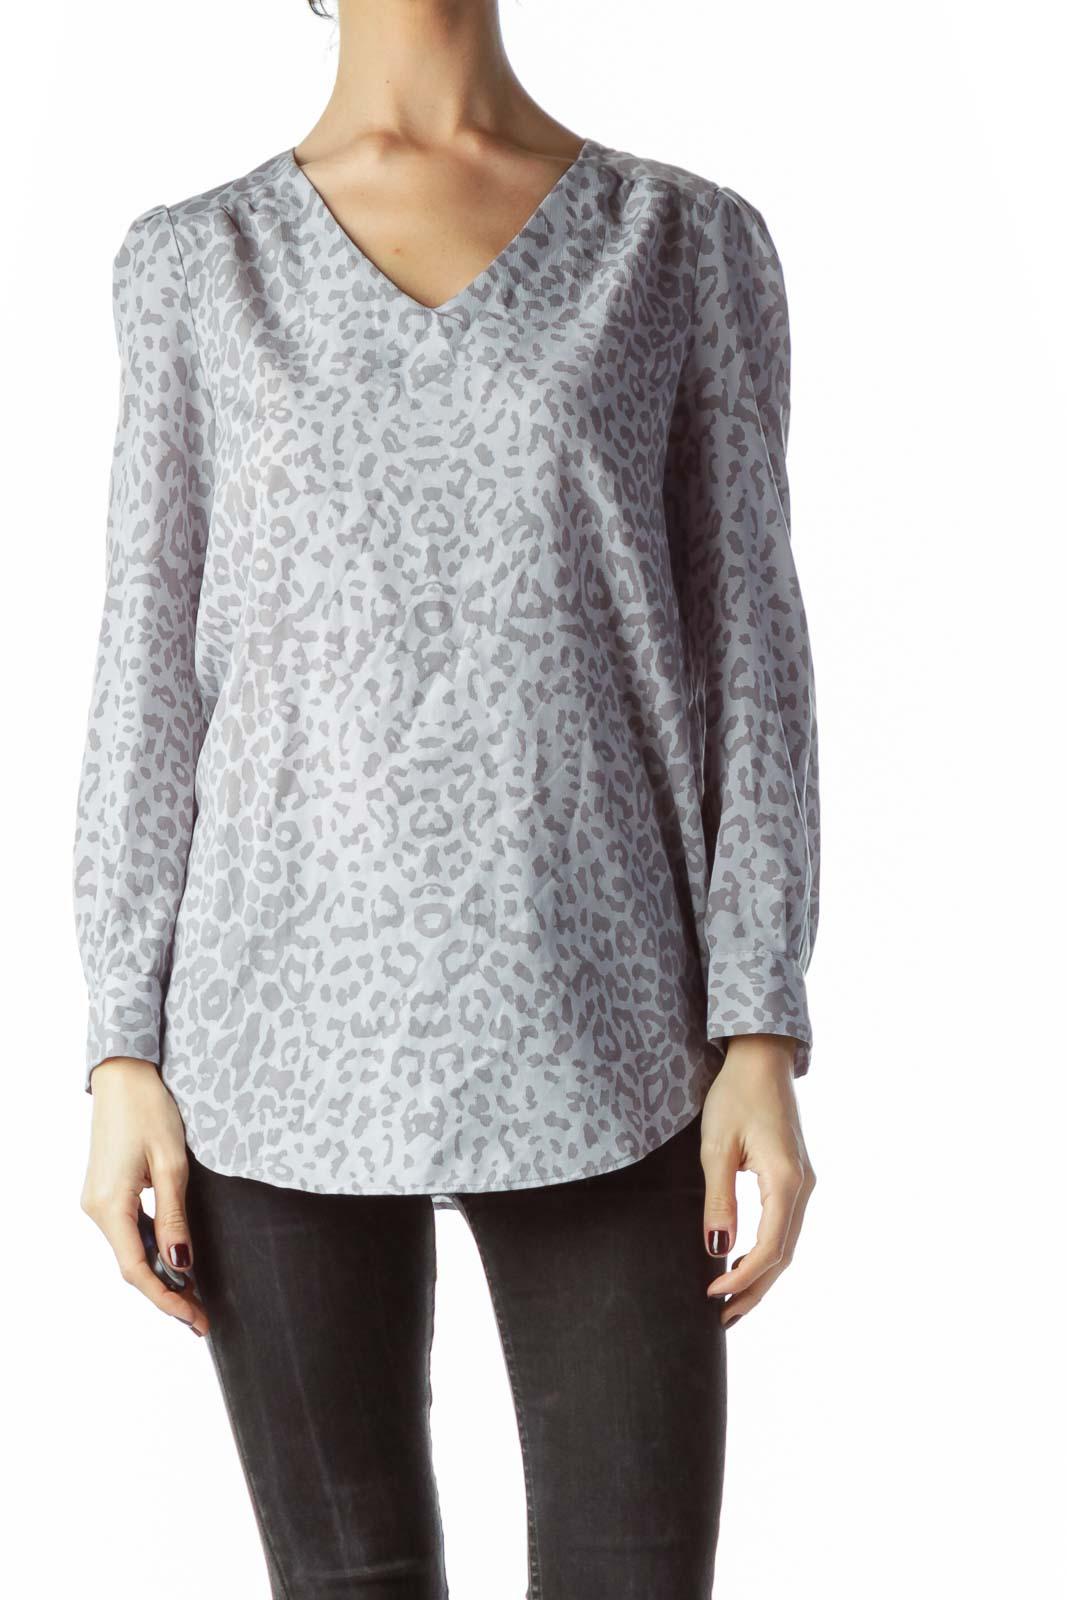 Gray Animal Print Blouse Front